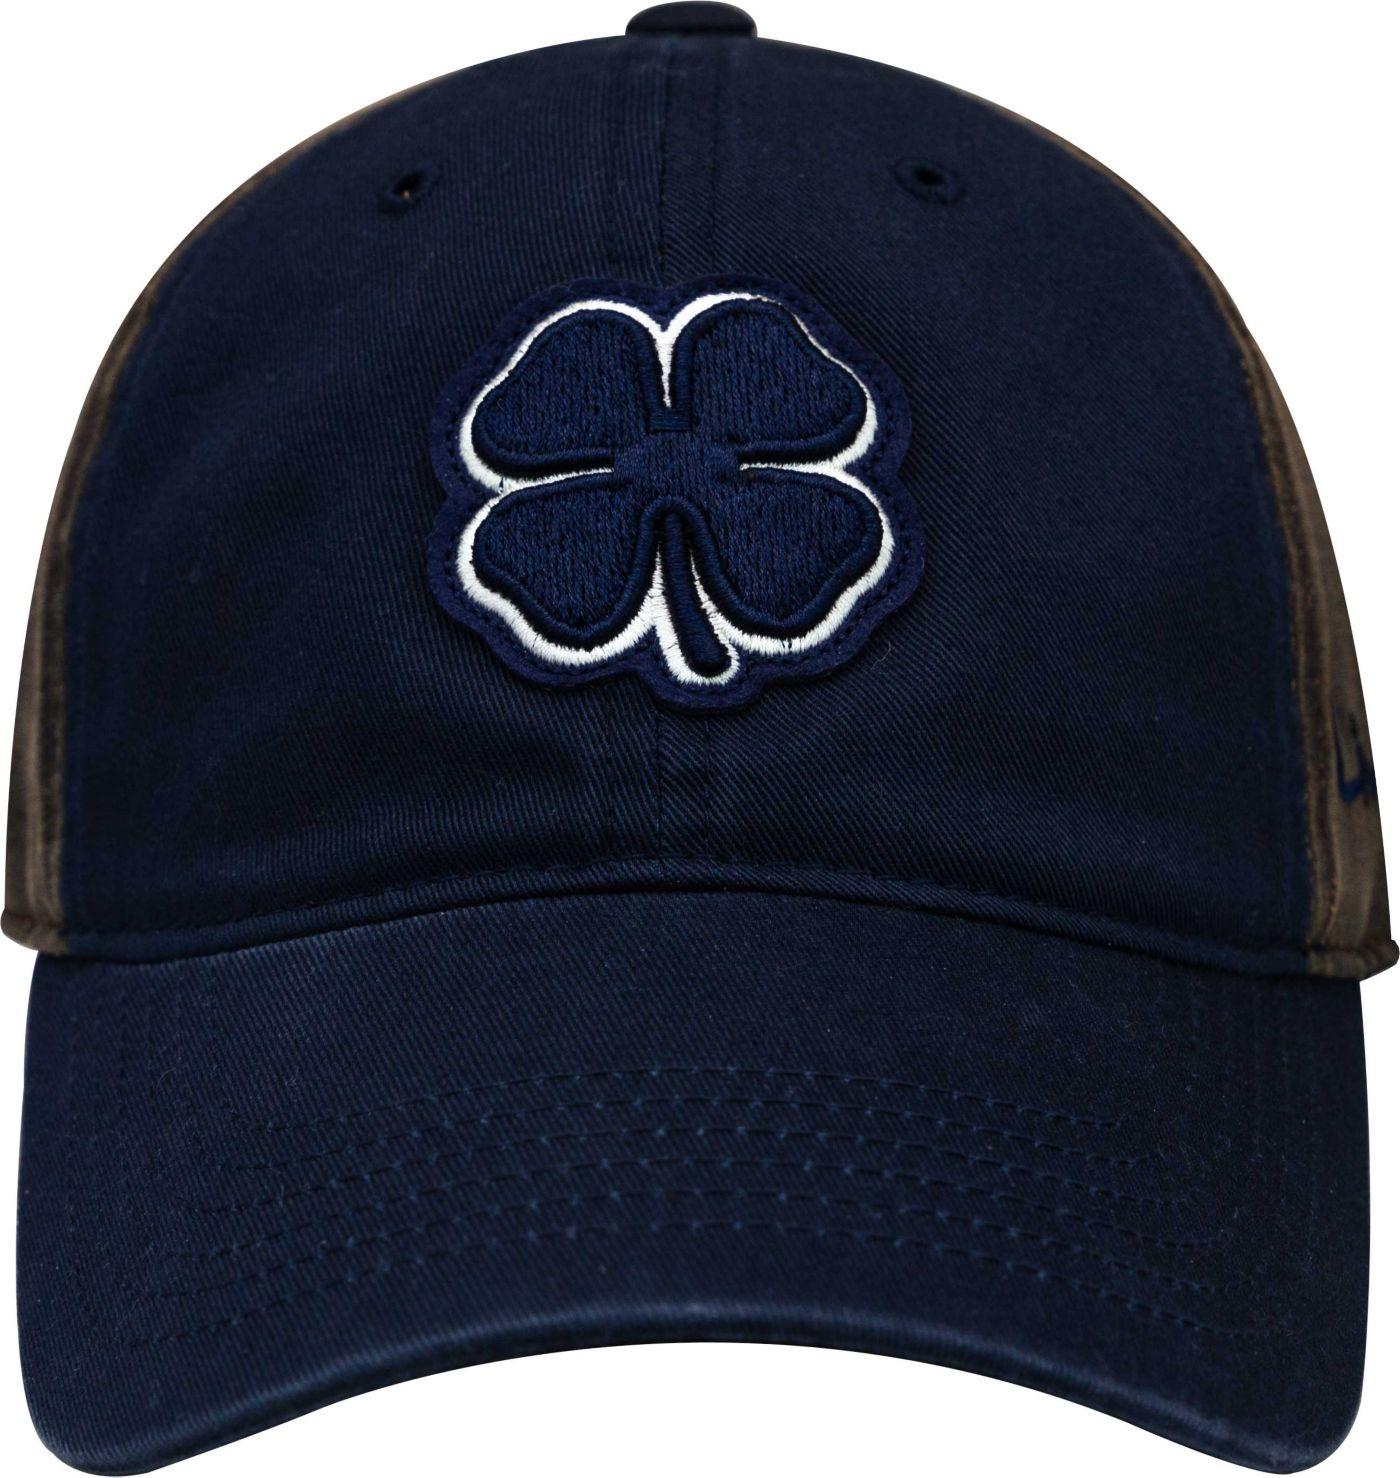 Black Clover Men's Meadows Golf Hat